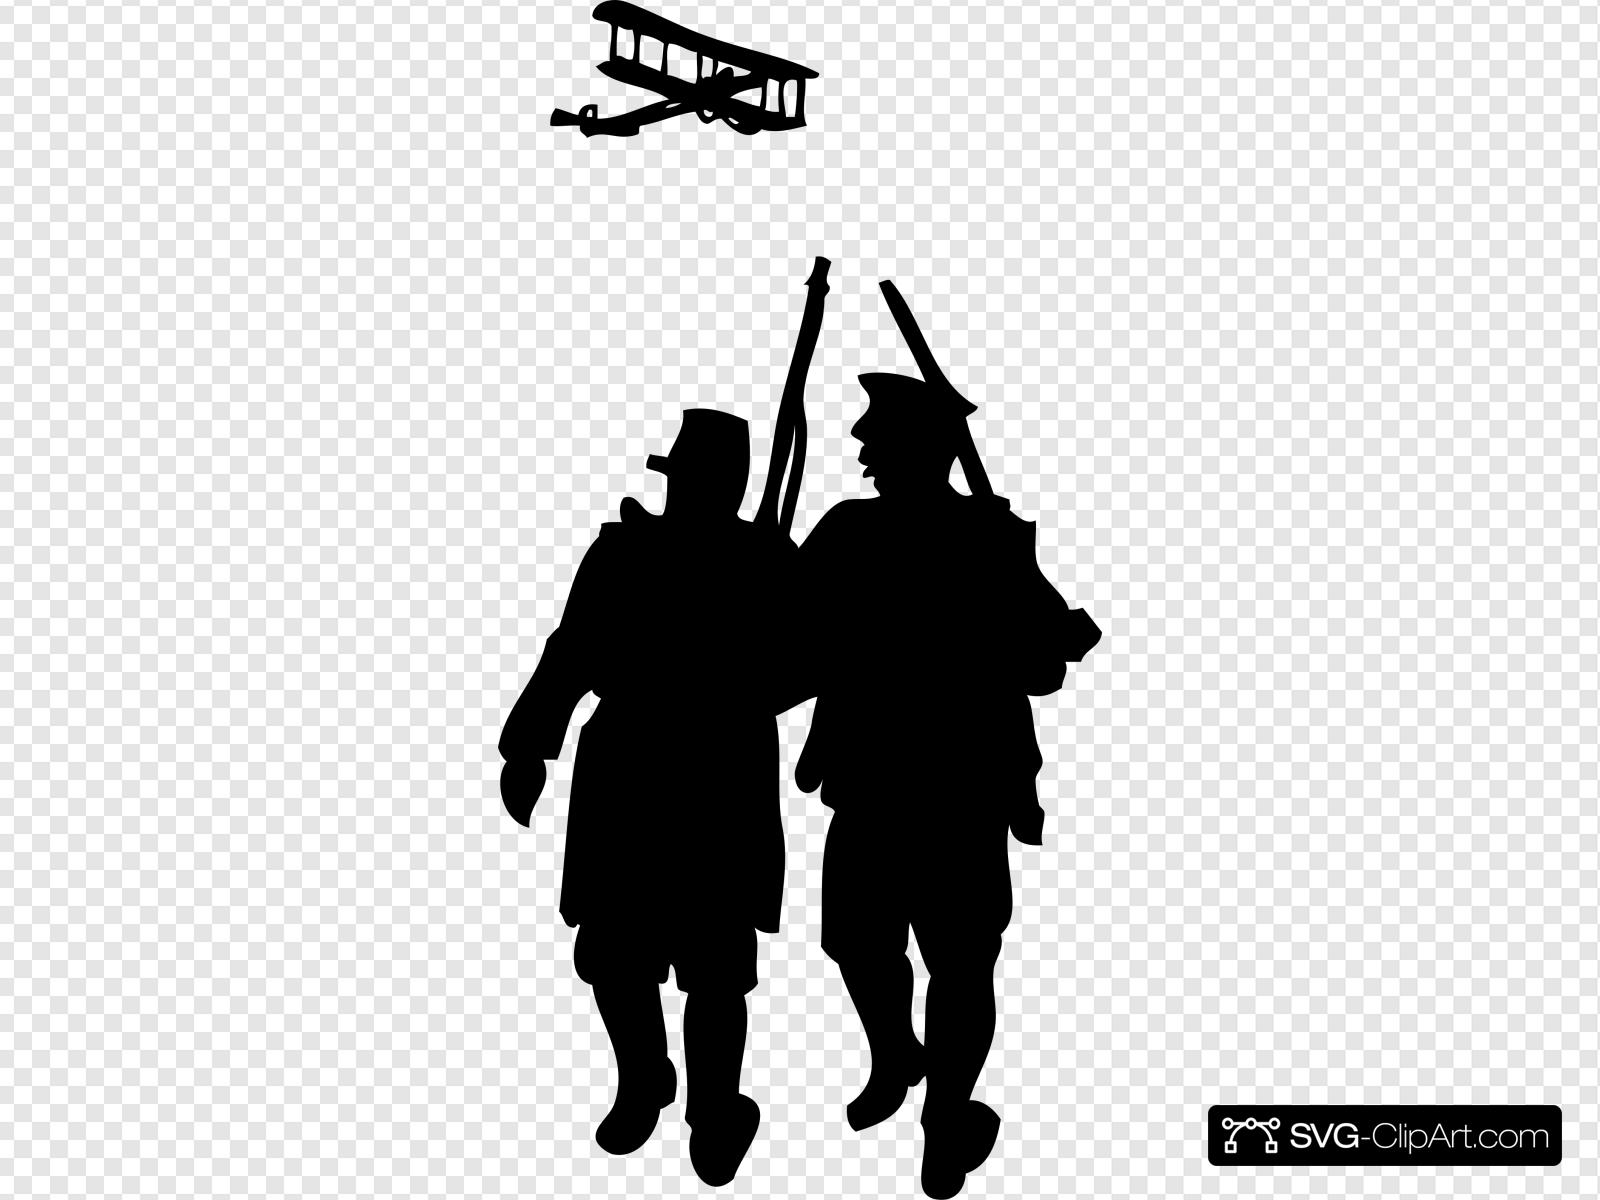 World War I Silhouette Clip art, Icon and SVG.